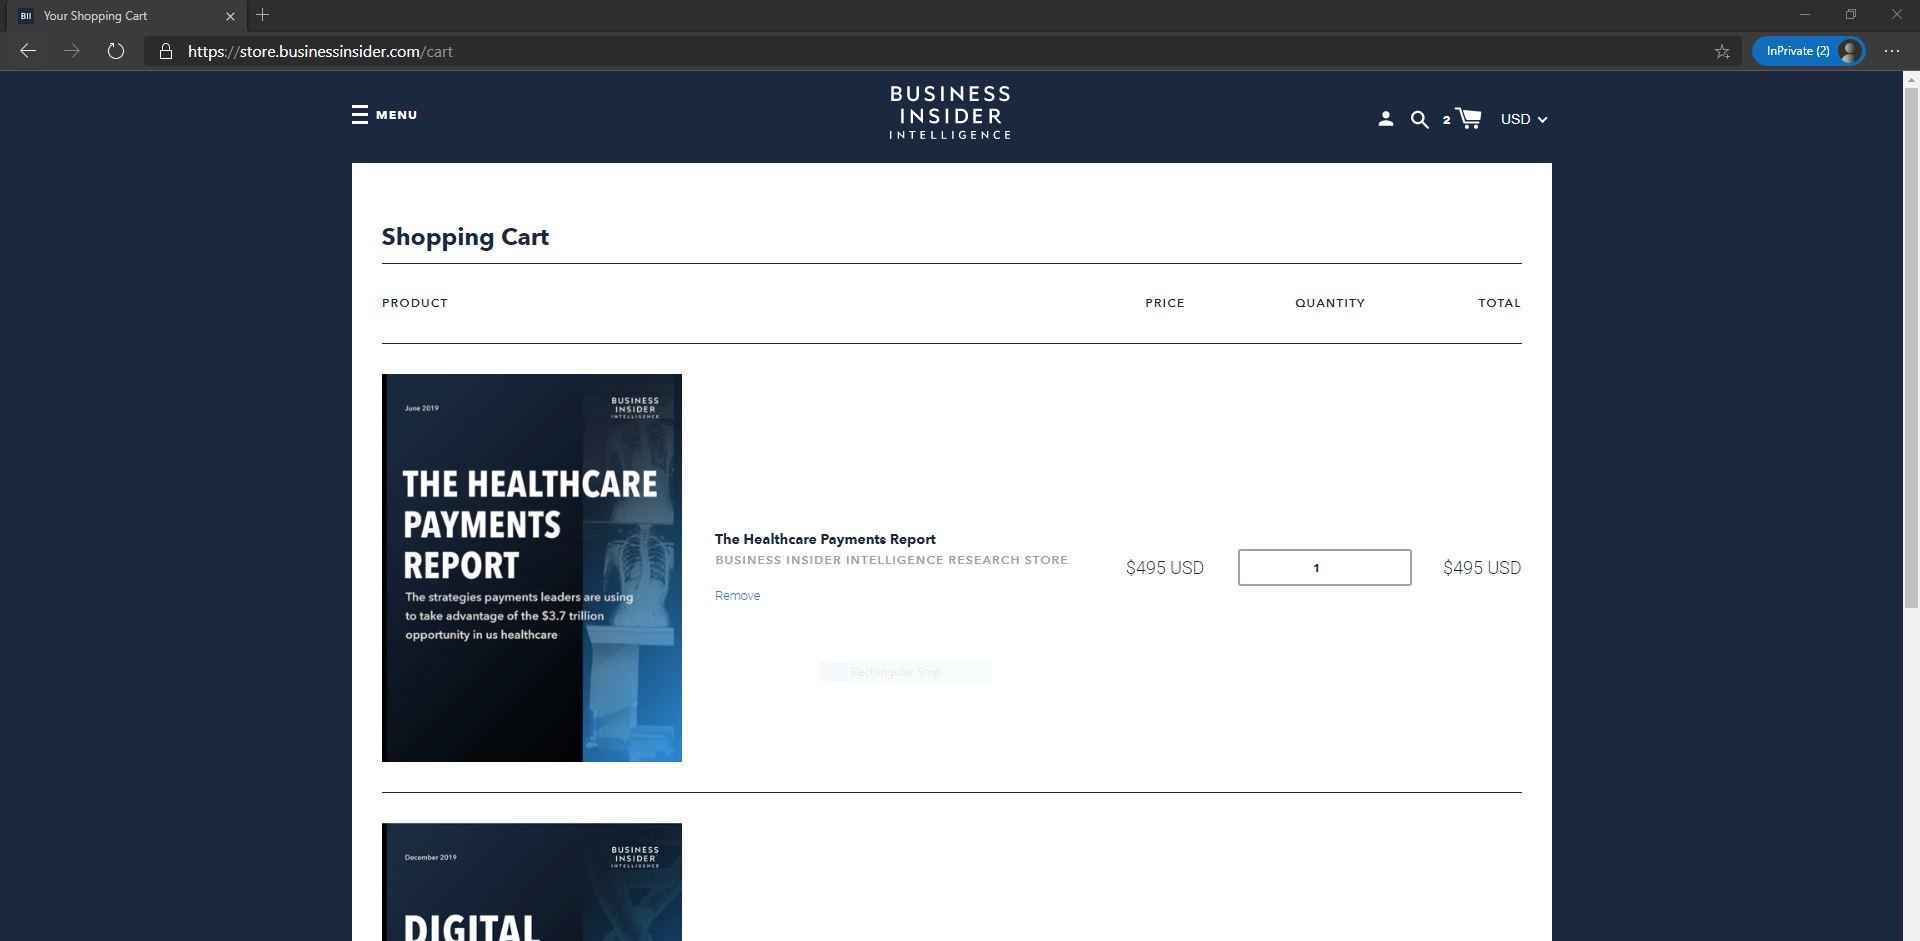 Business Insider resource marketplace